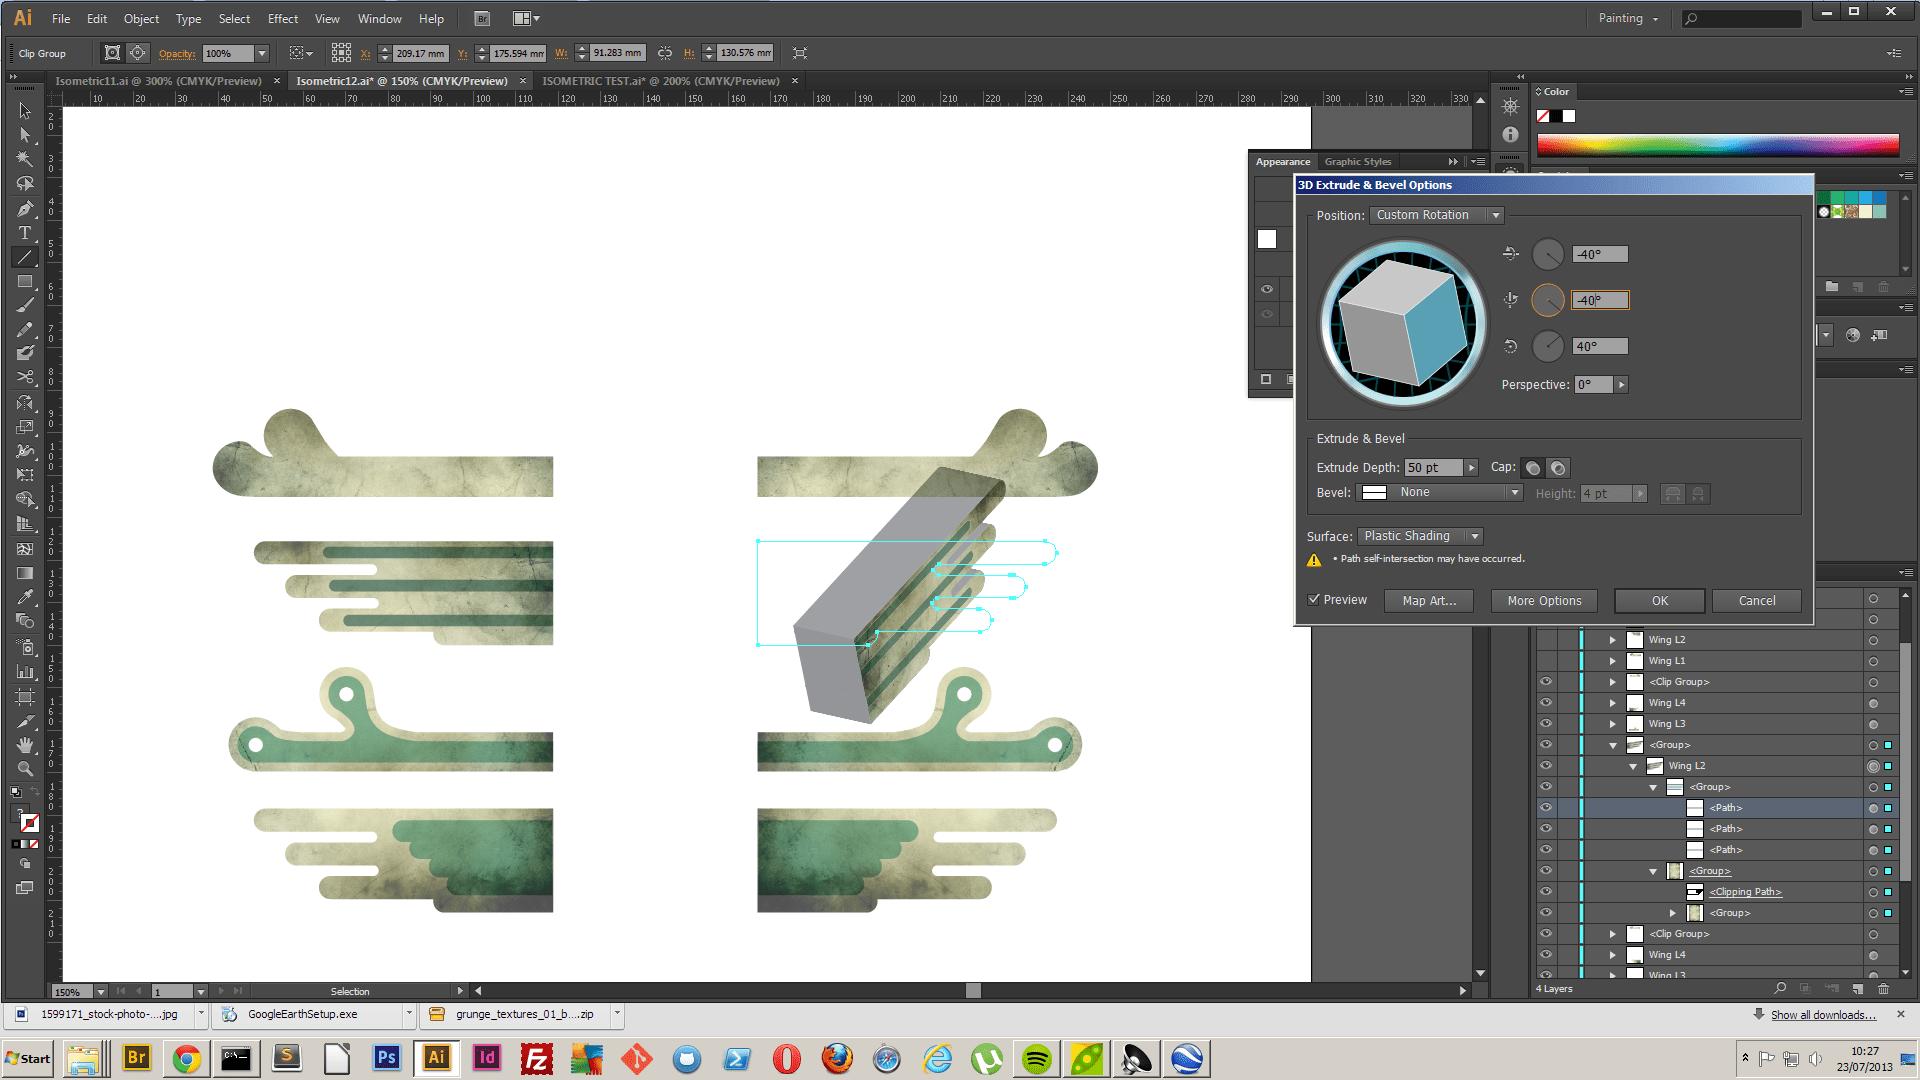 Illustrator 3D Extrude And Bevel Problem Graphic Design